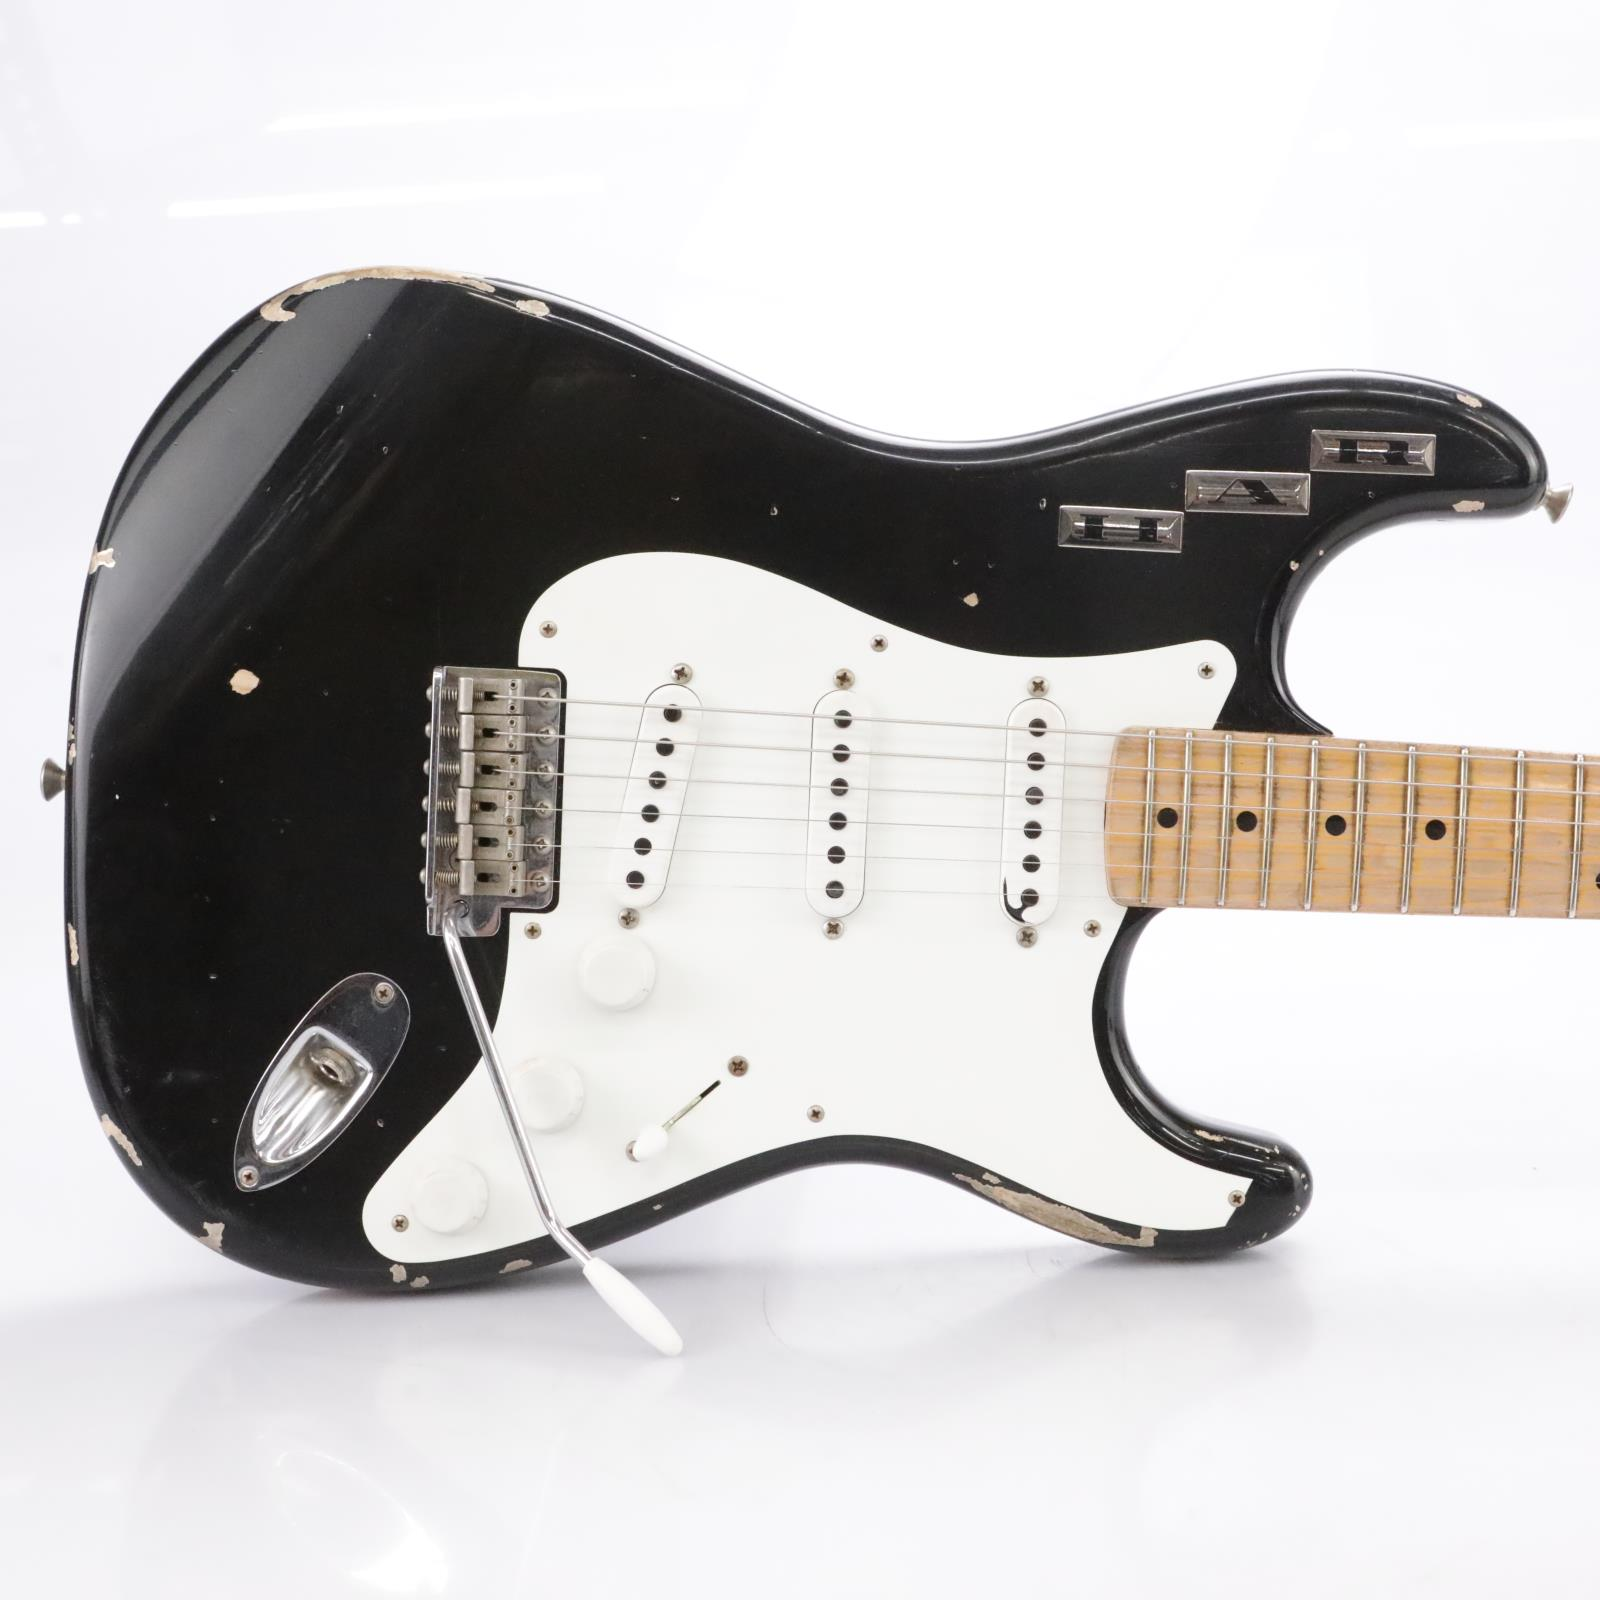 Fender Masterbuilt HAR Strat MB-DG Stratocaster Bonamassa Prototype #43990